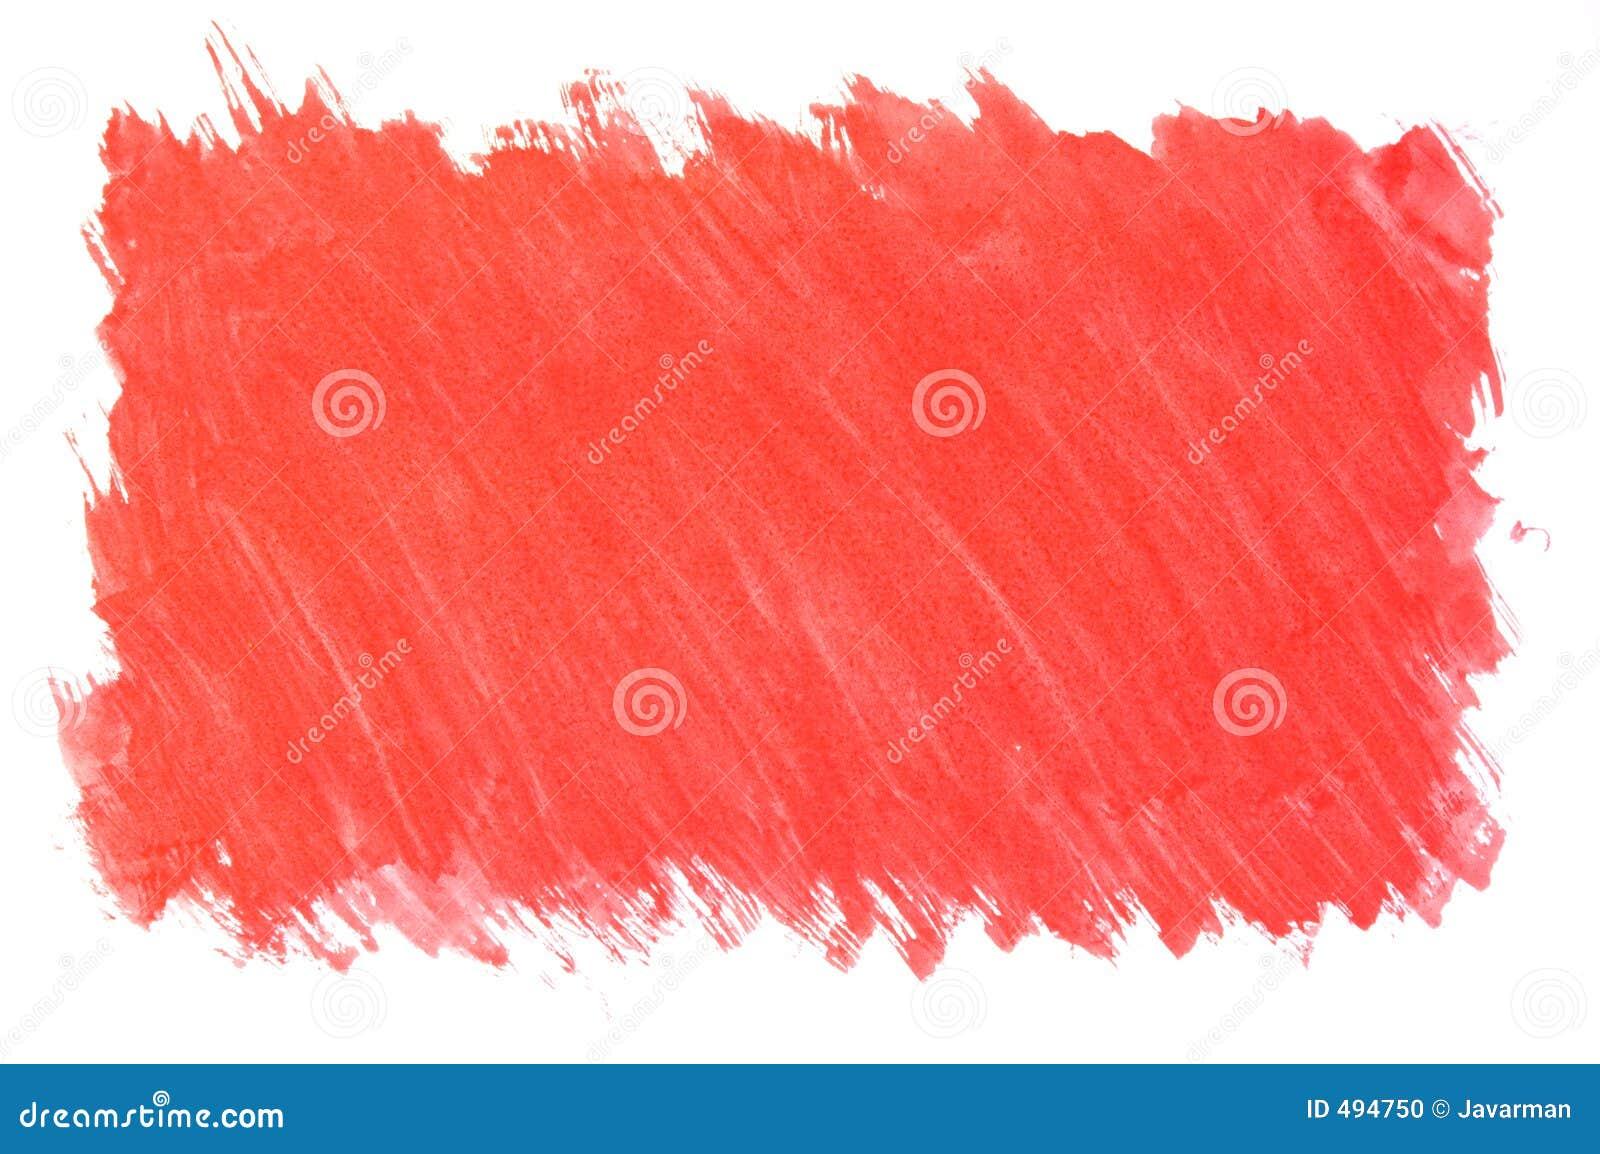 Geschilderde rode achtergrond